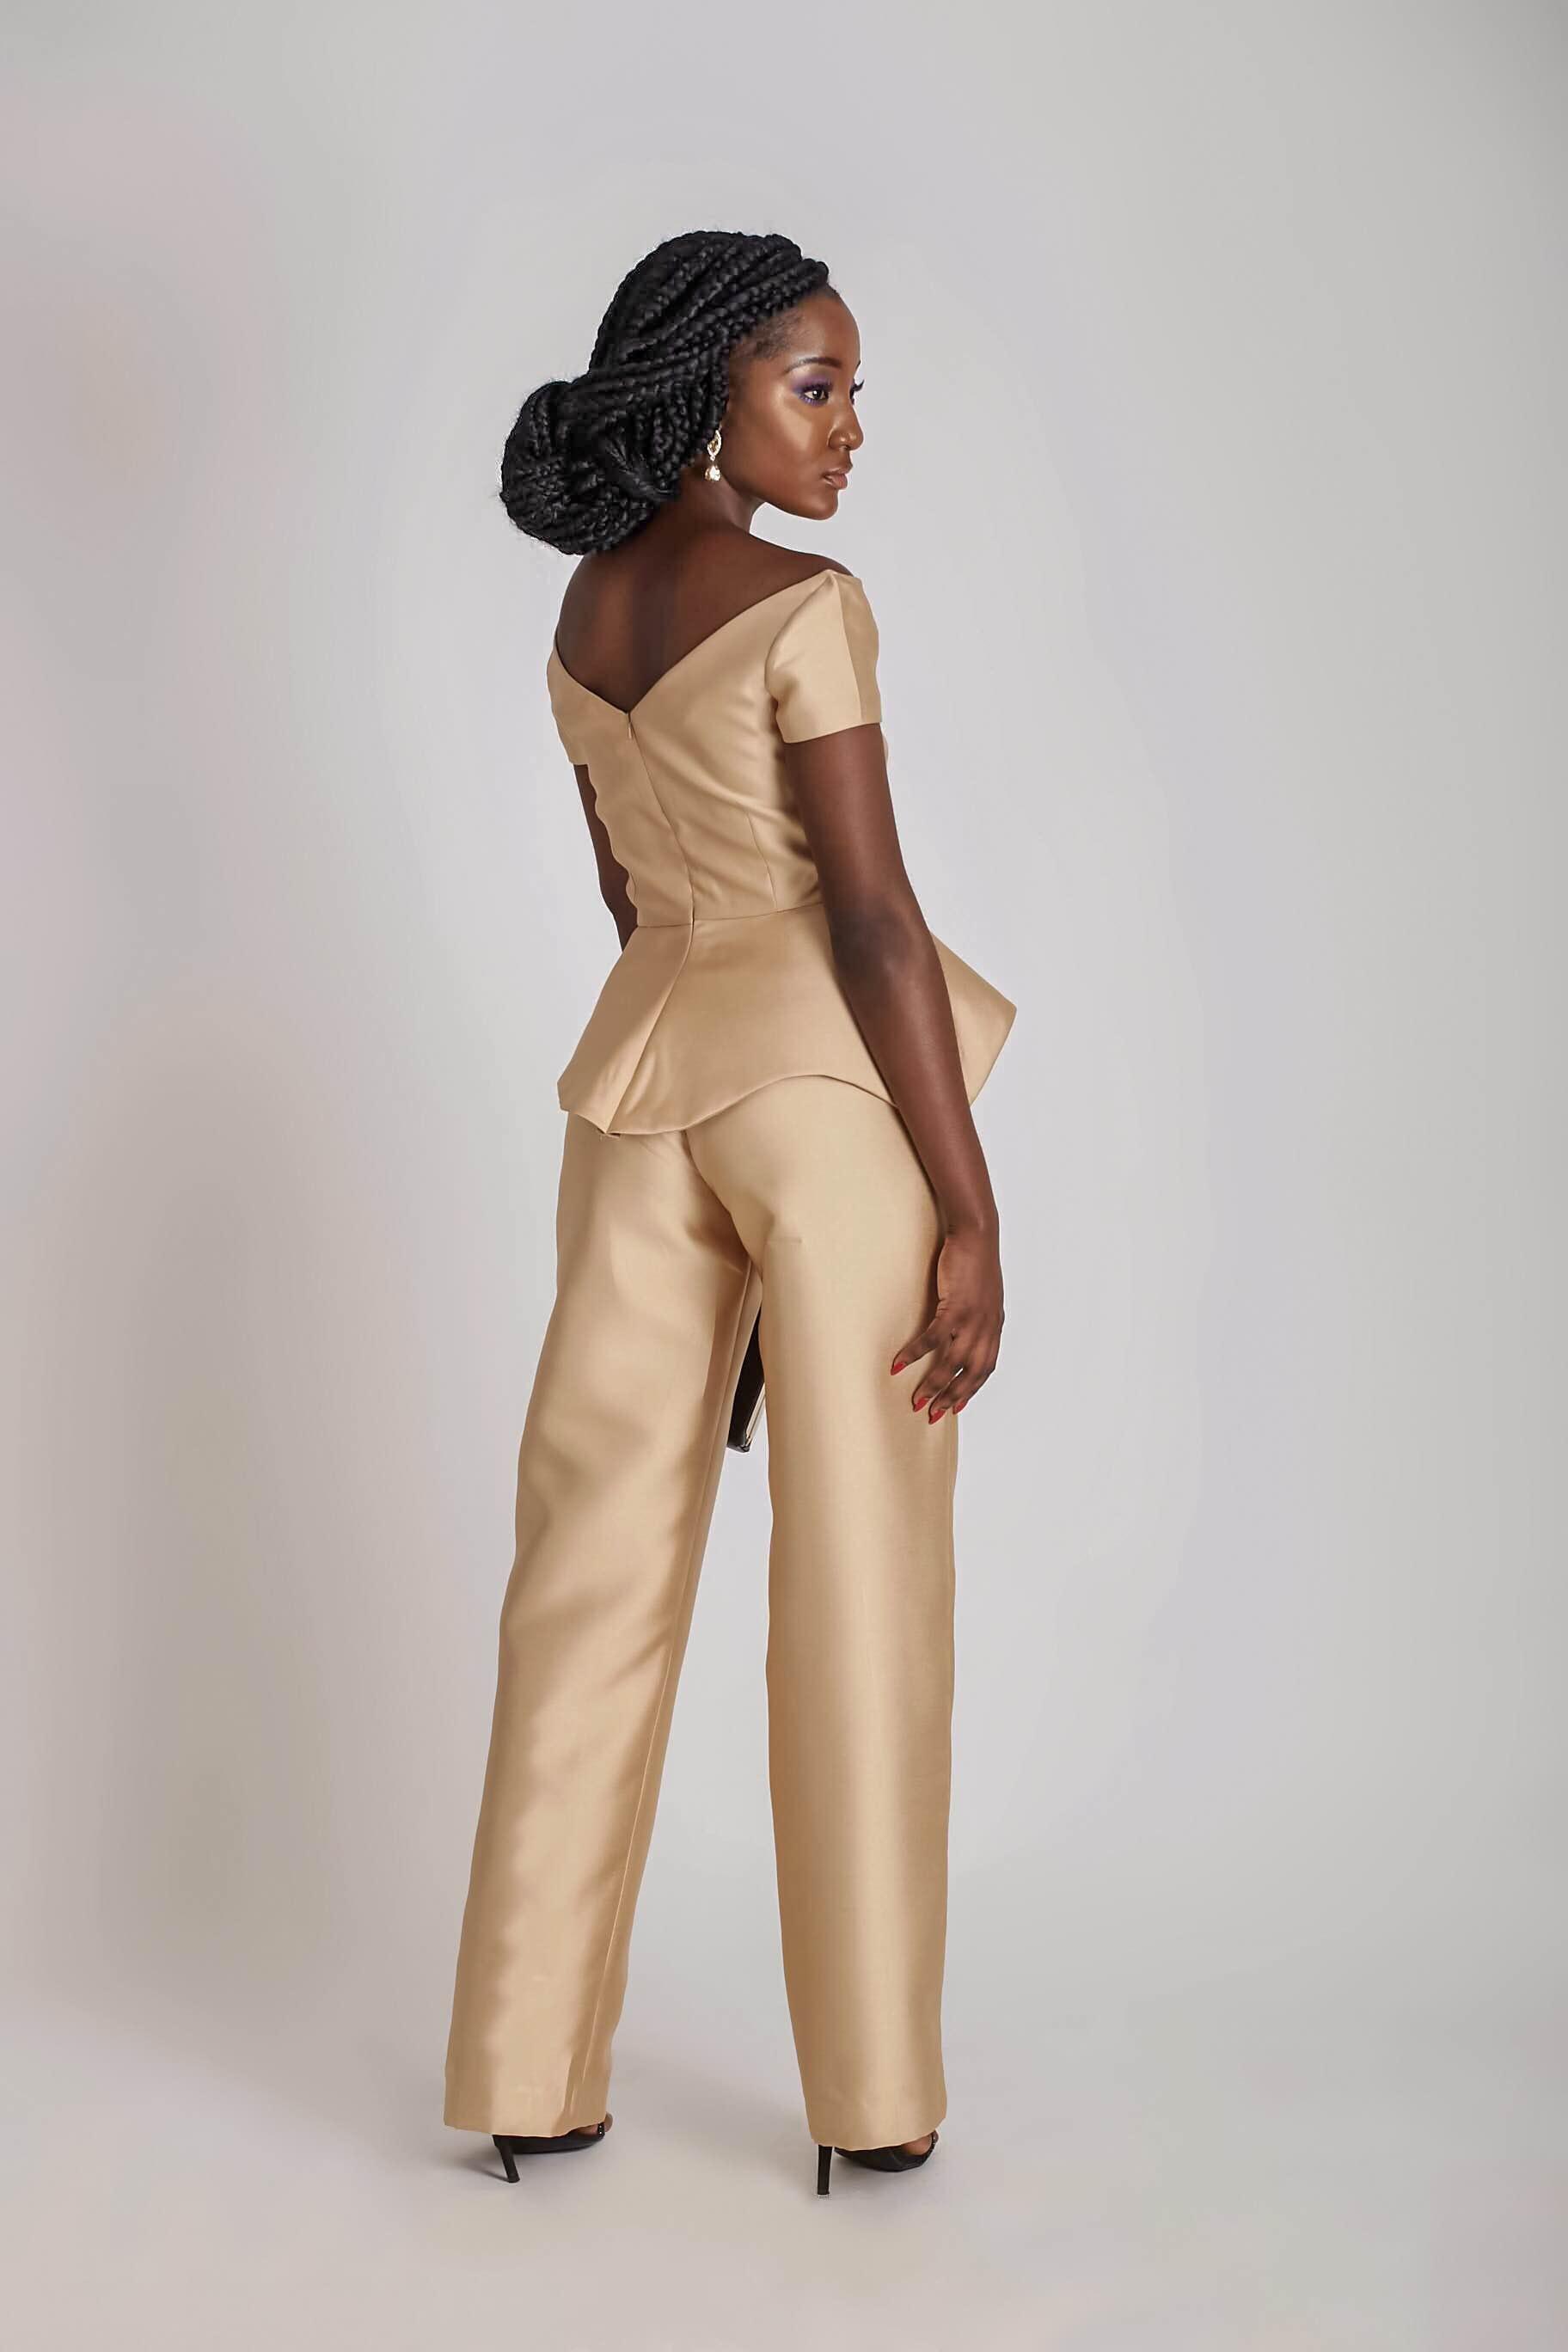 Imad Eduso - BN Style - Collection Lookbook - BellaNaija.com 017